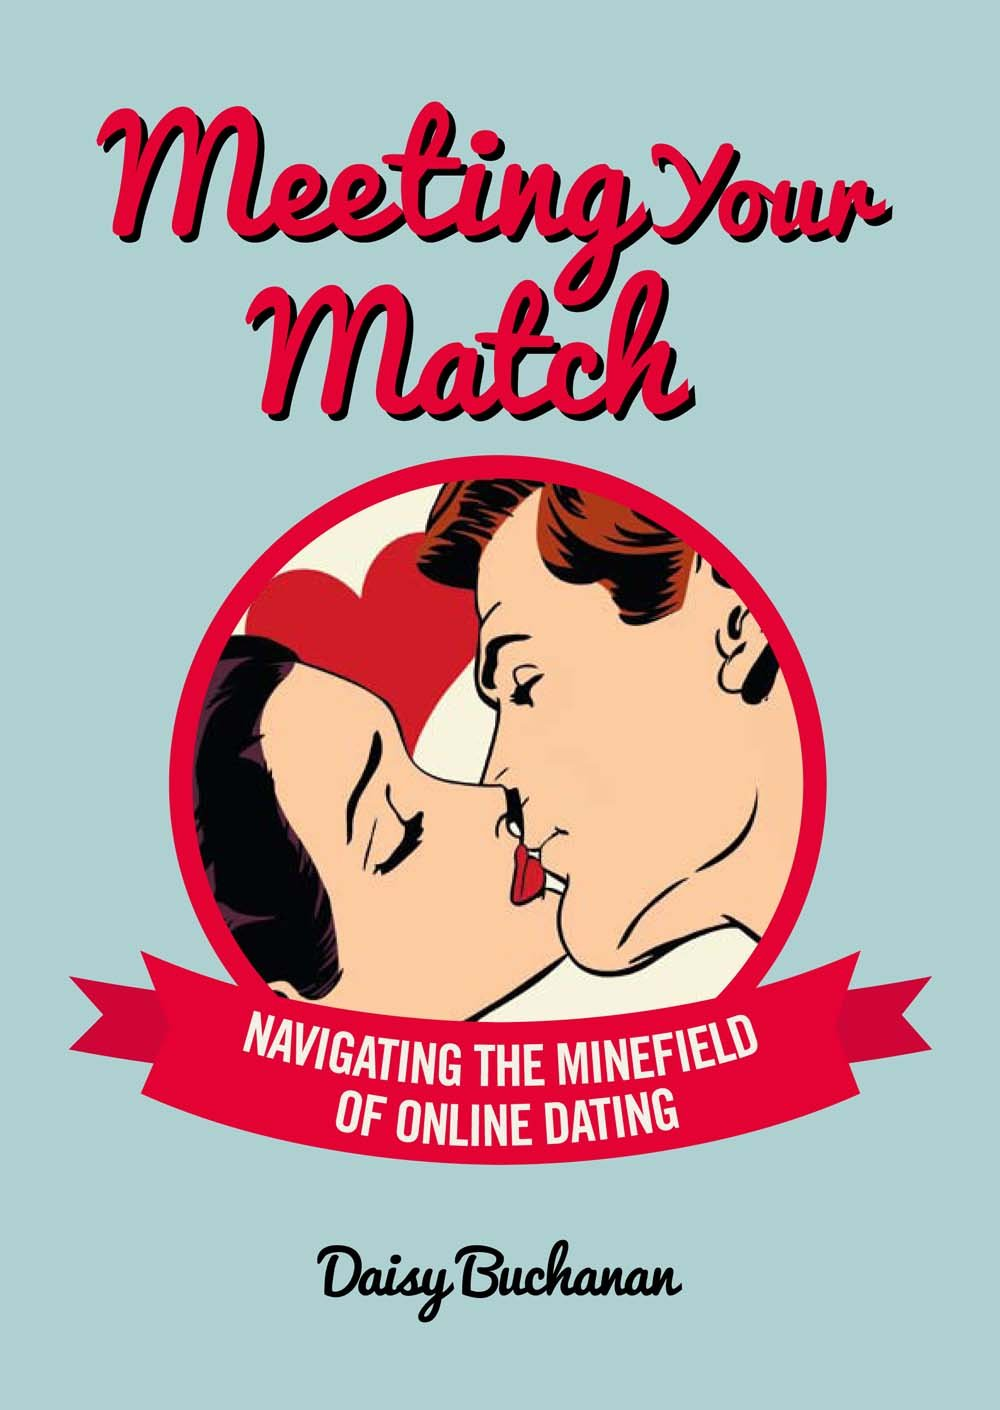 online dating minefield